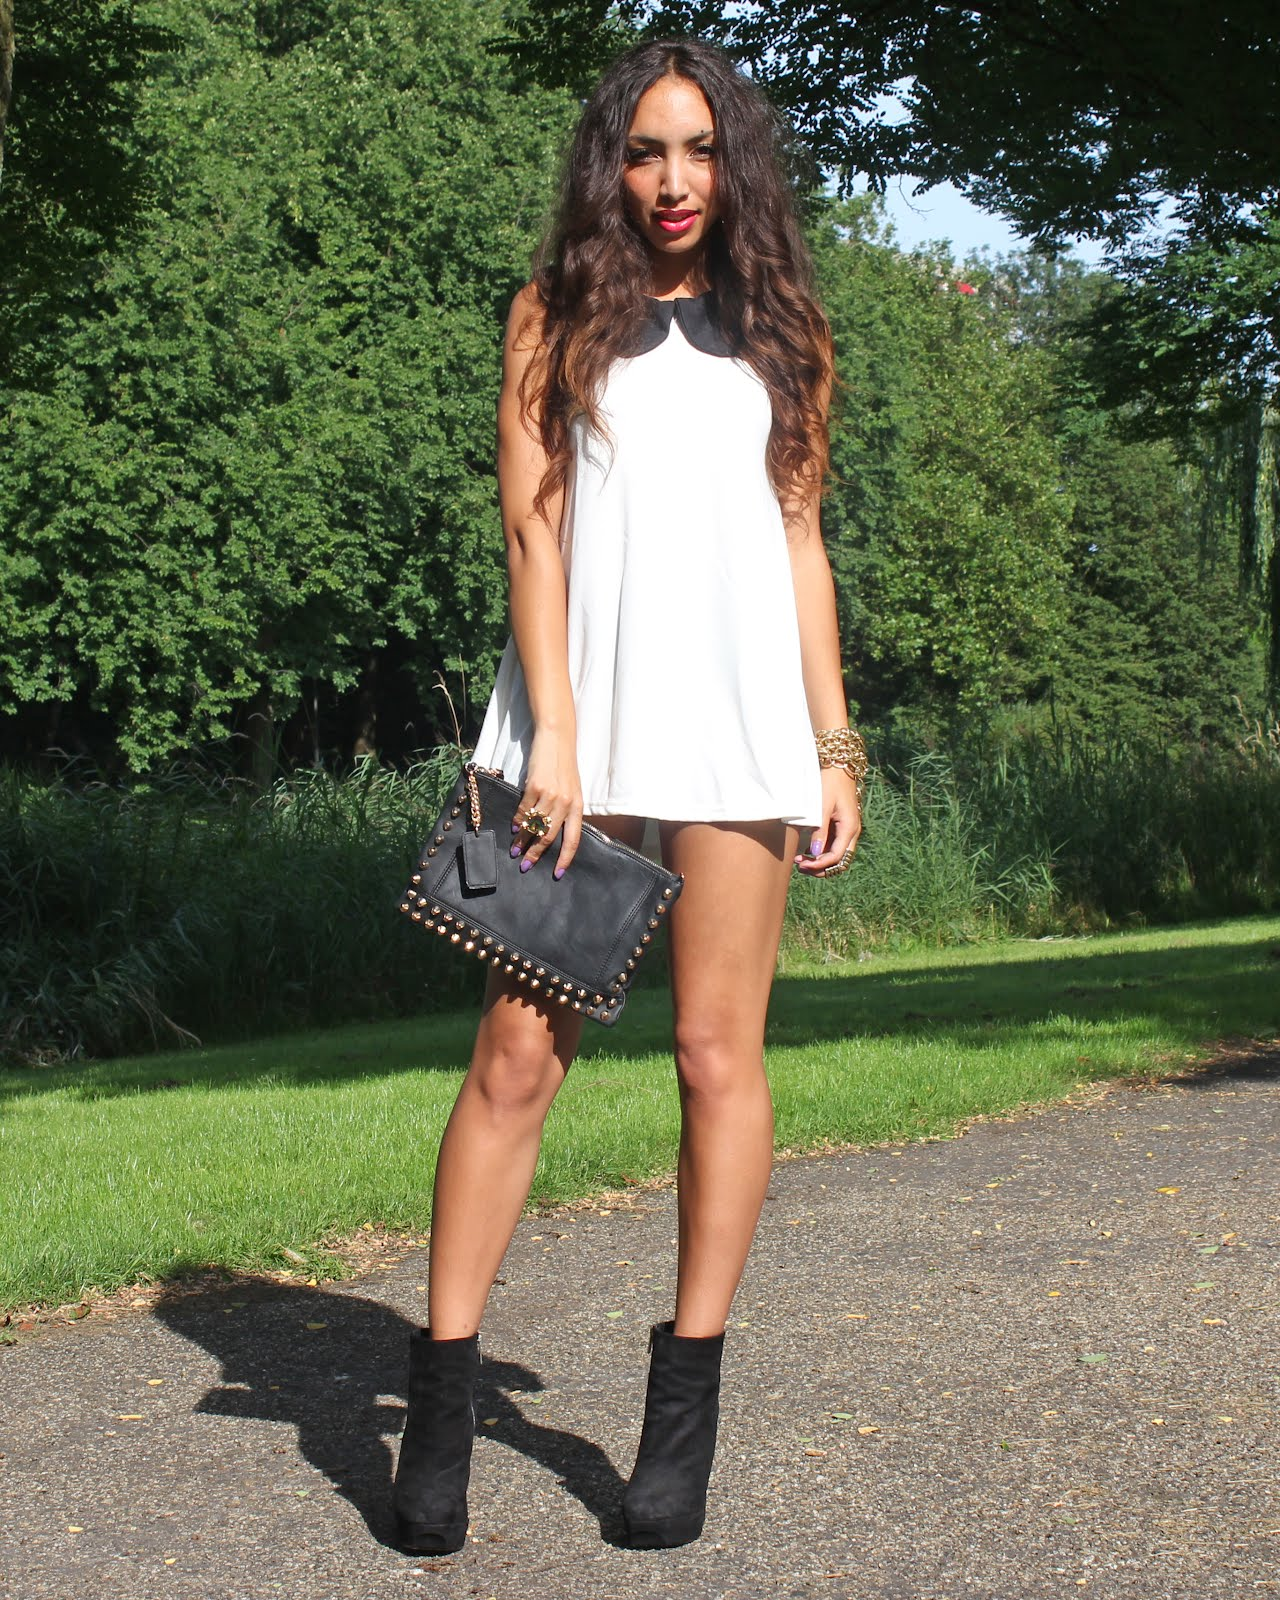 Long Legs Dresses 13